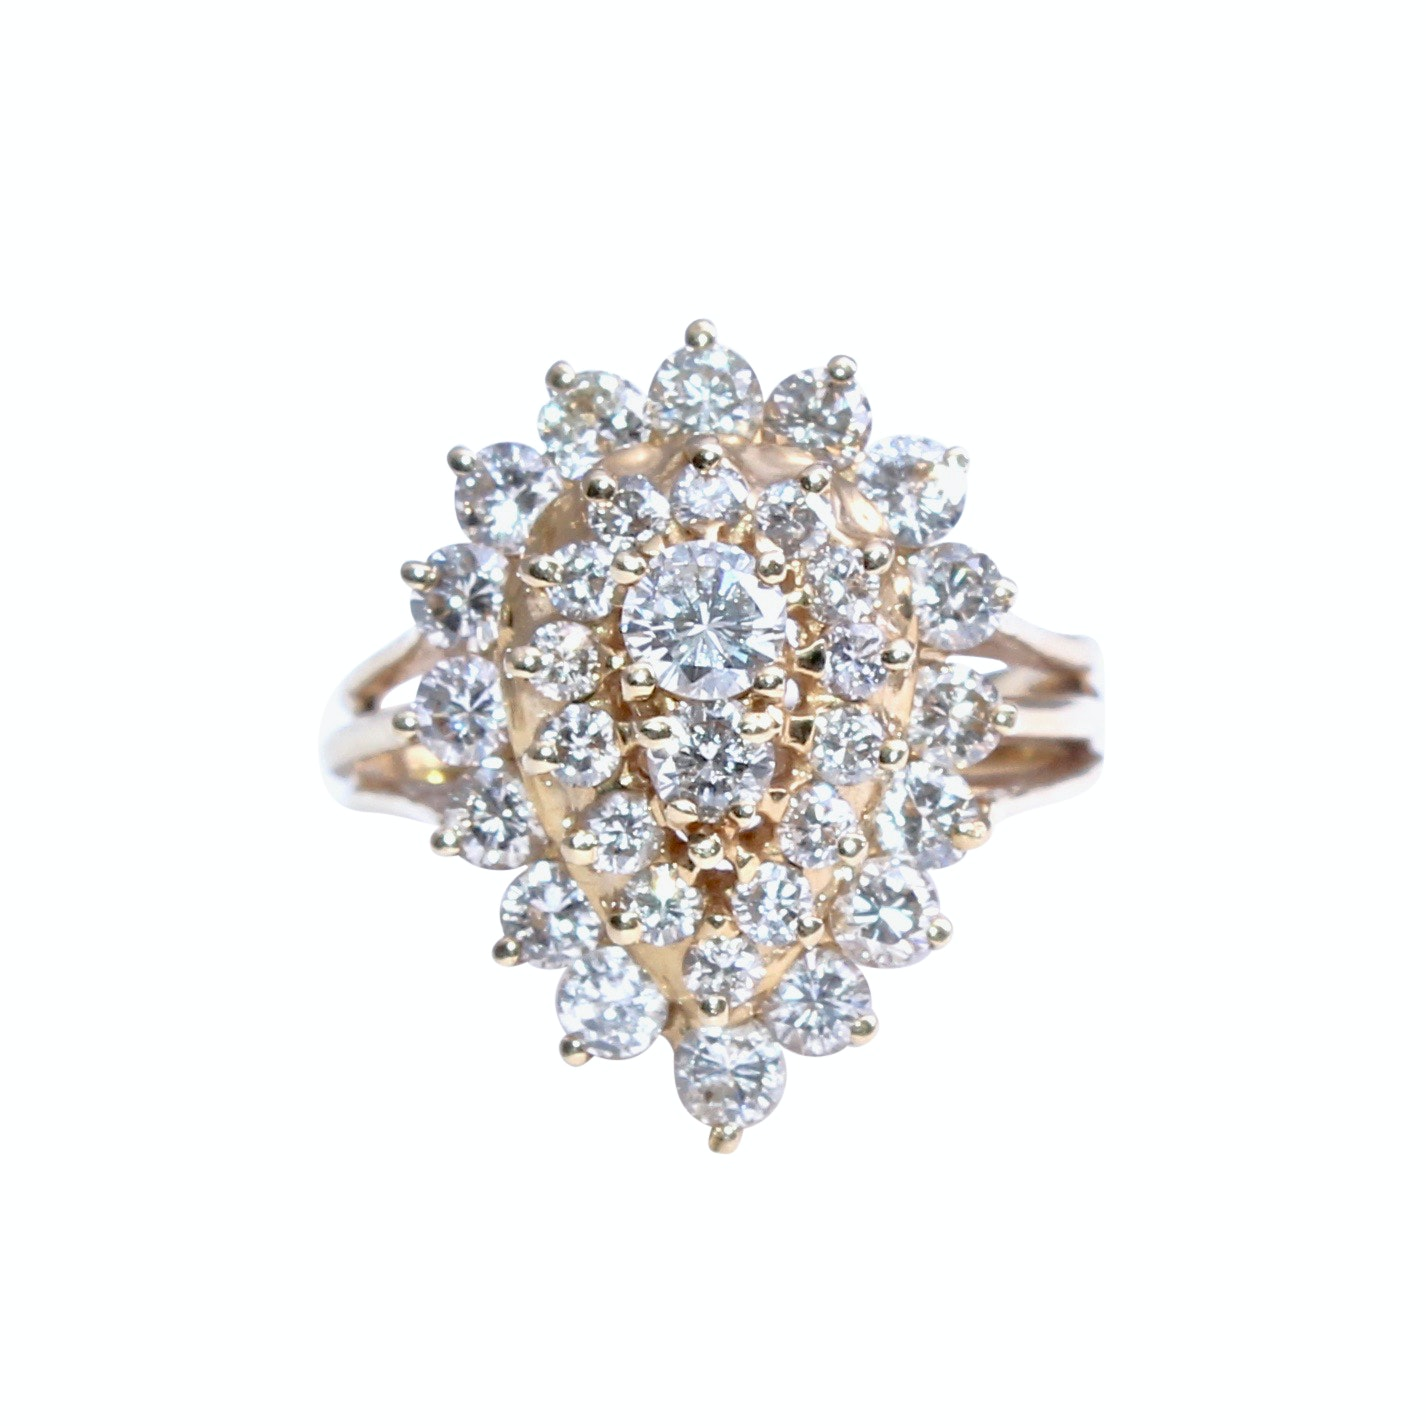 14K Yellow Gold 2.00 CTW Diamond Ring